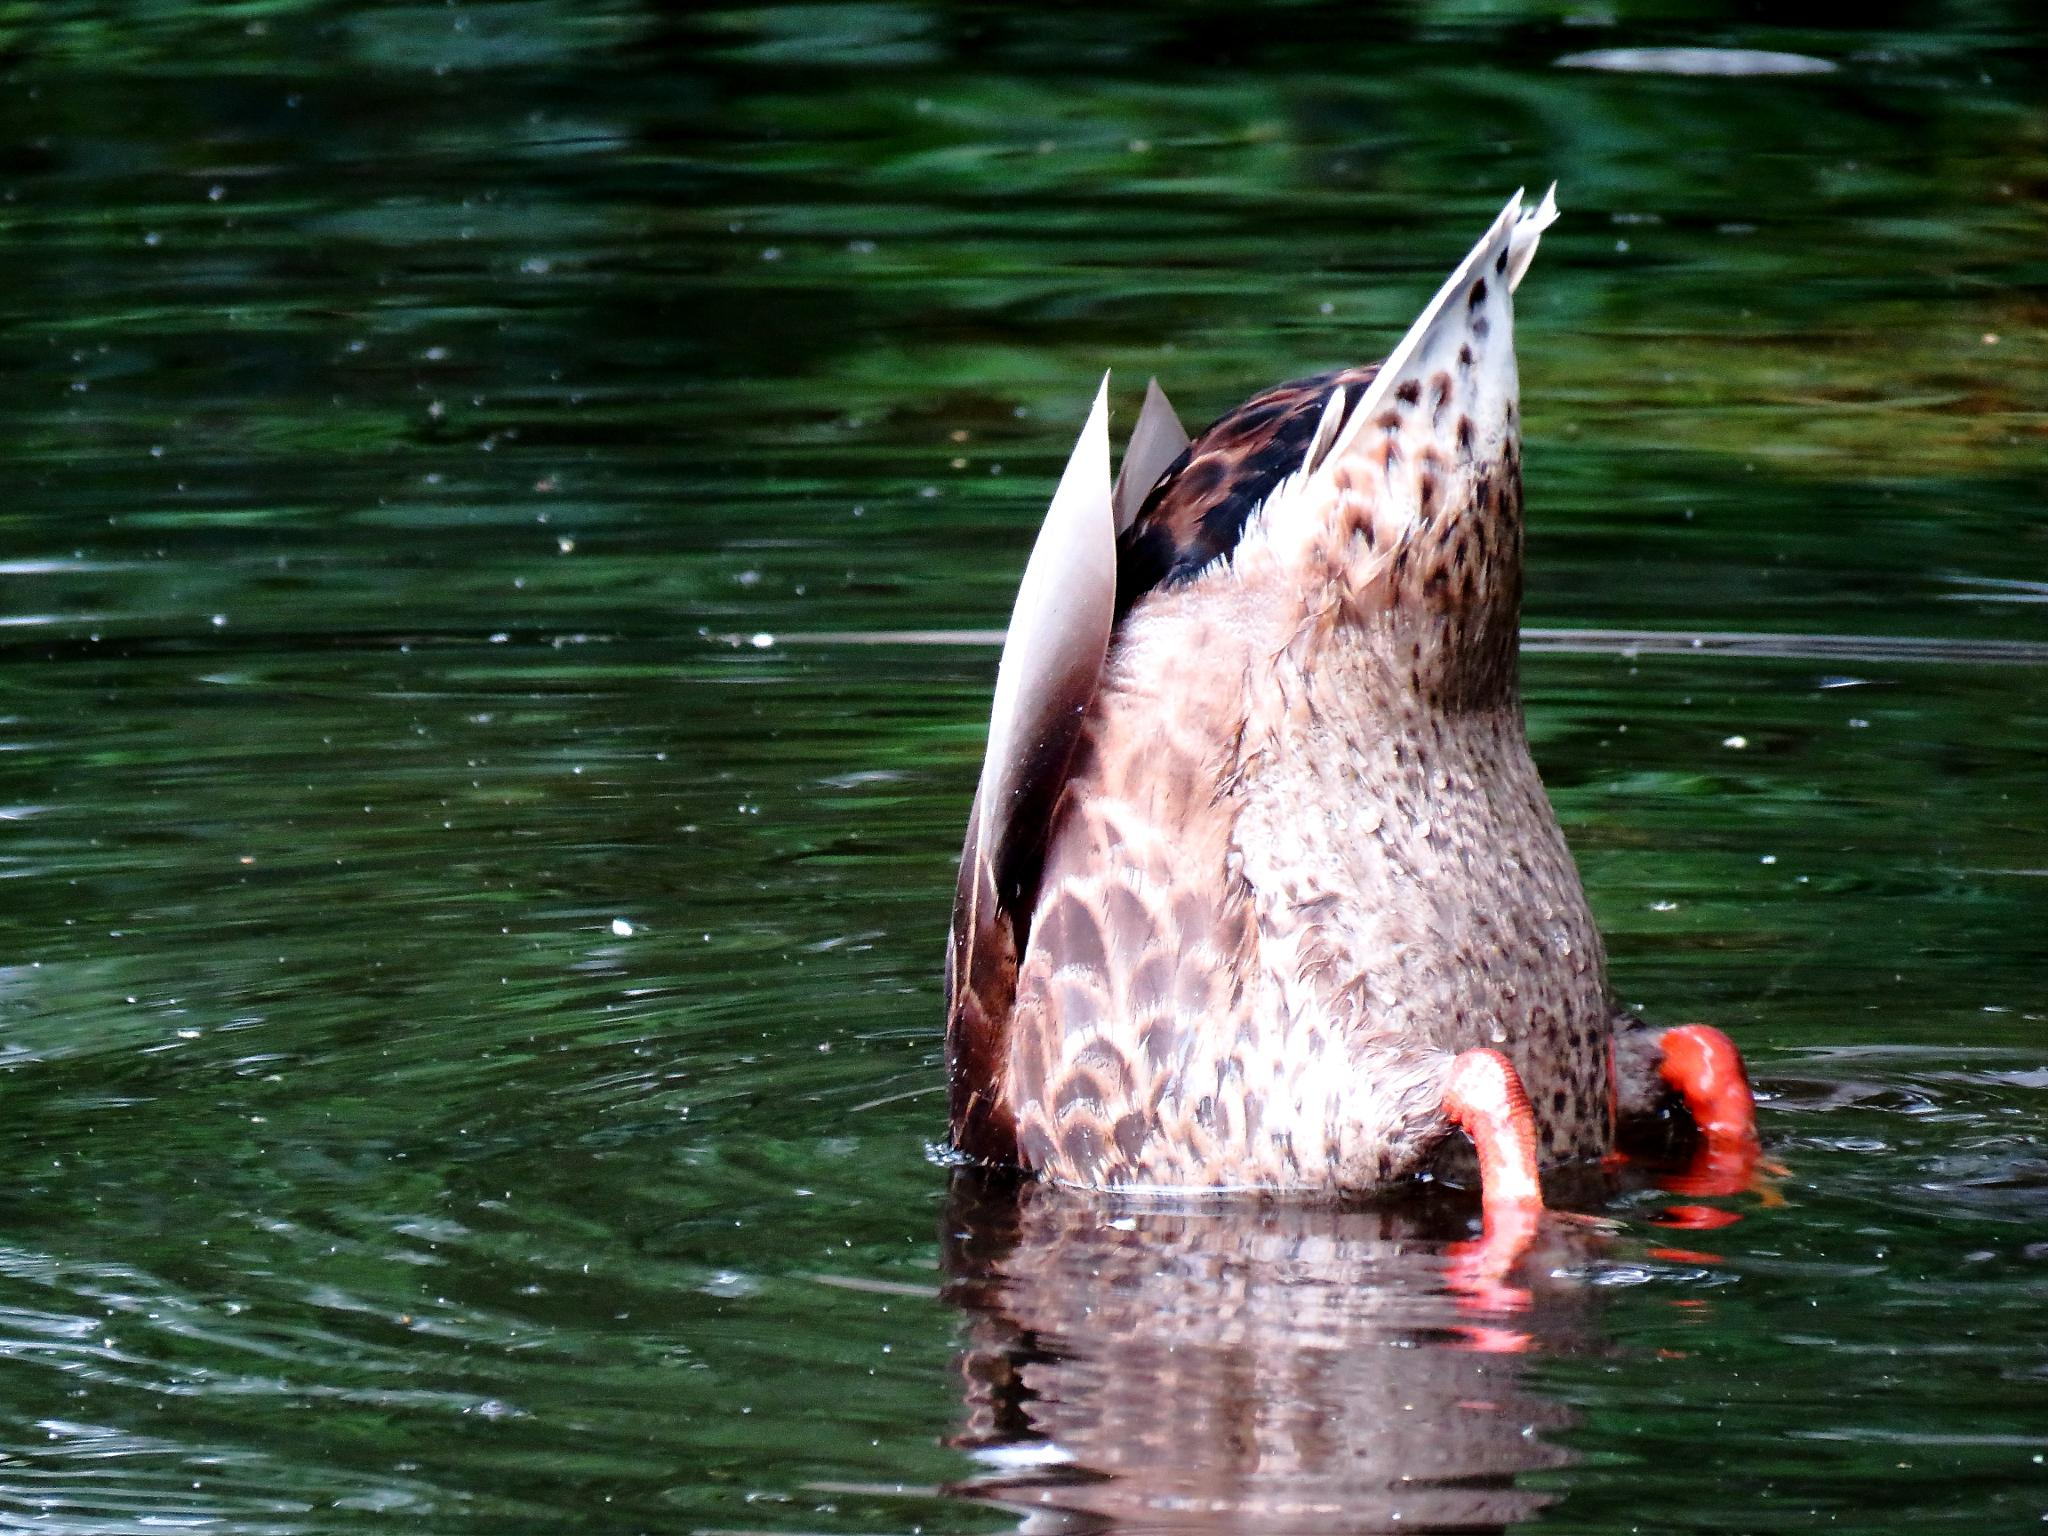 Diving Duck by Henrik Printz